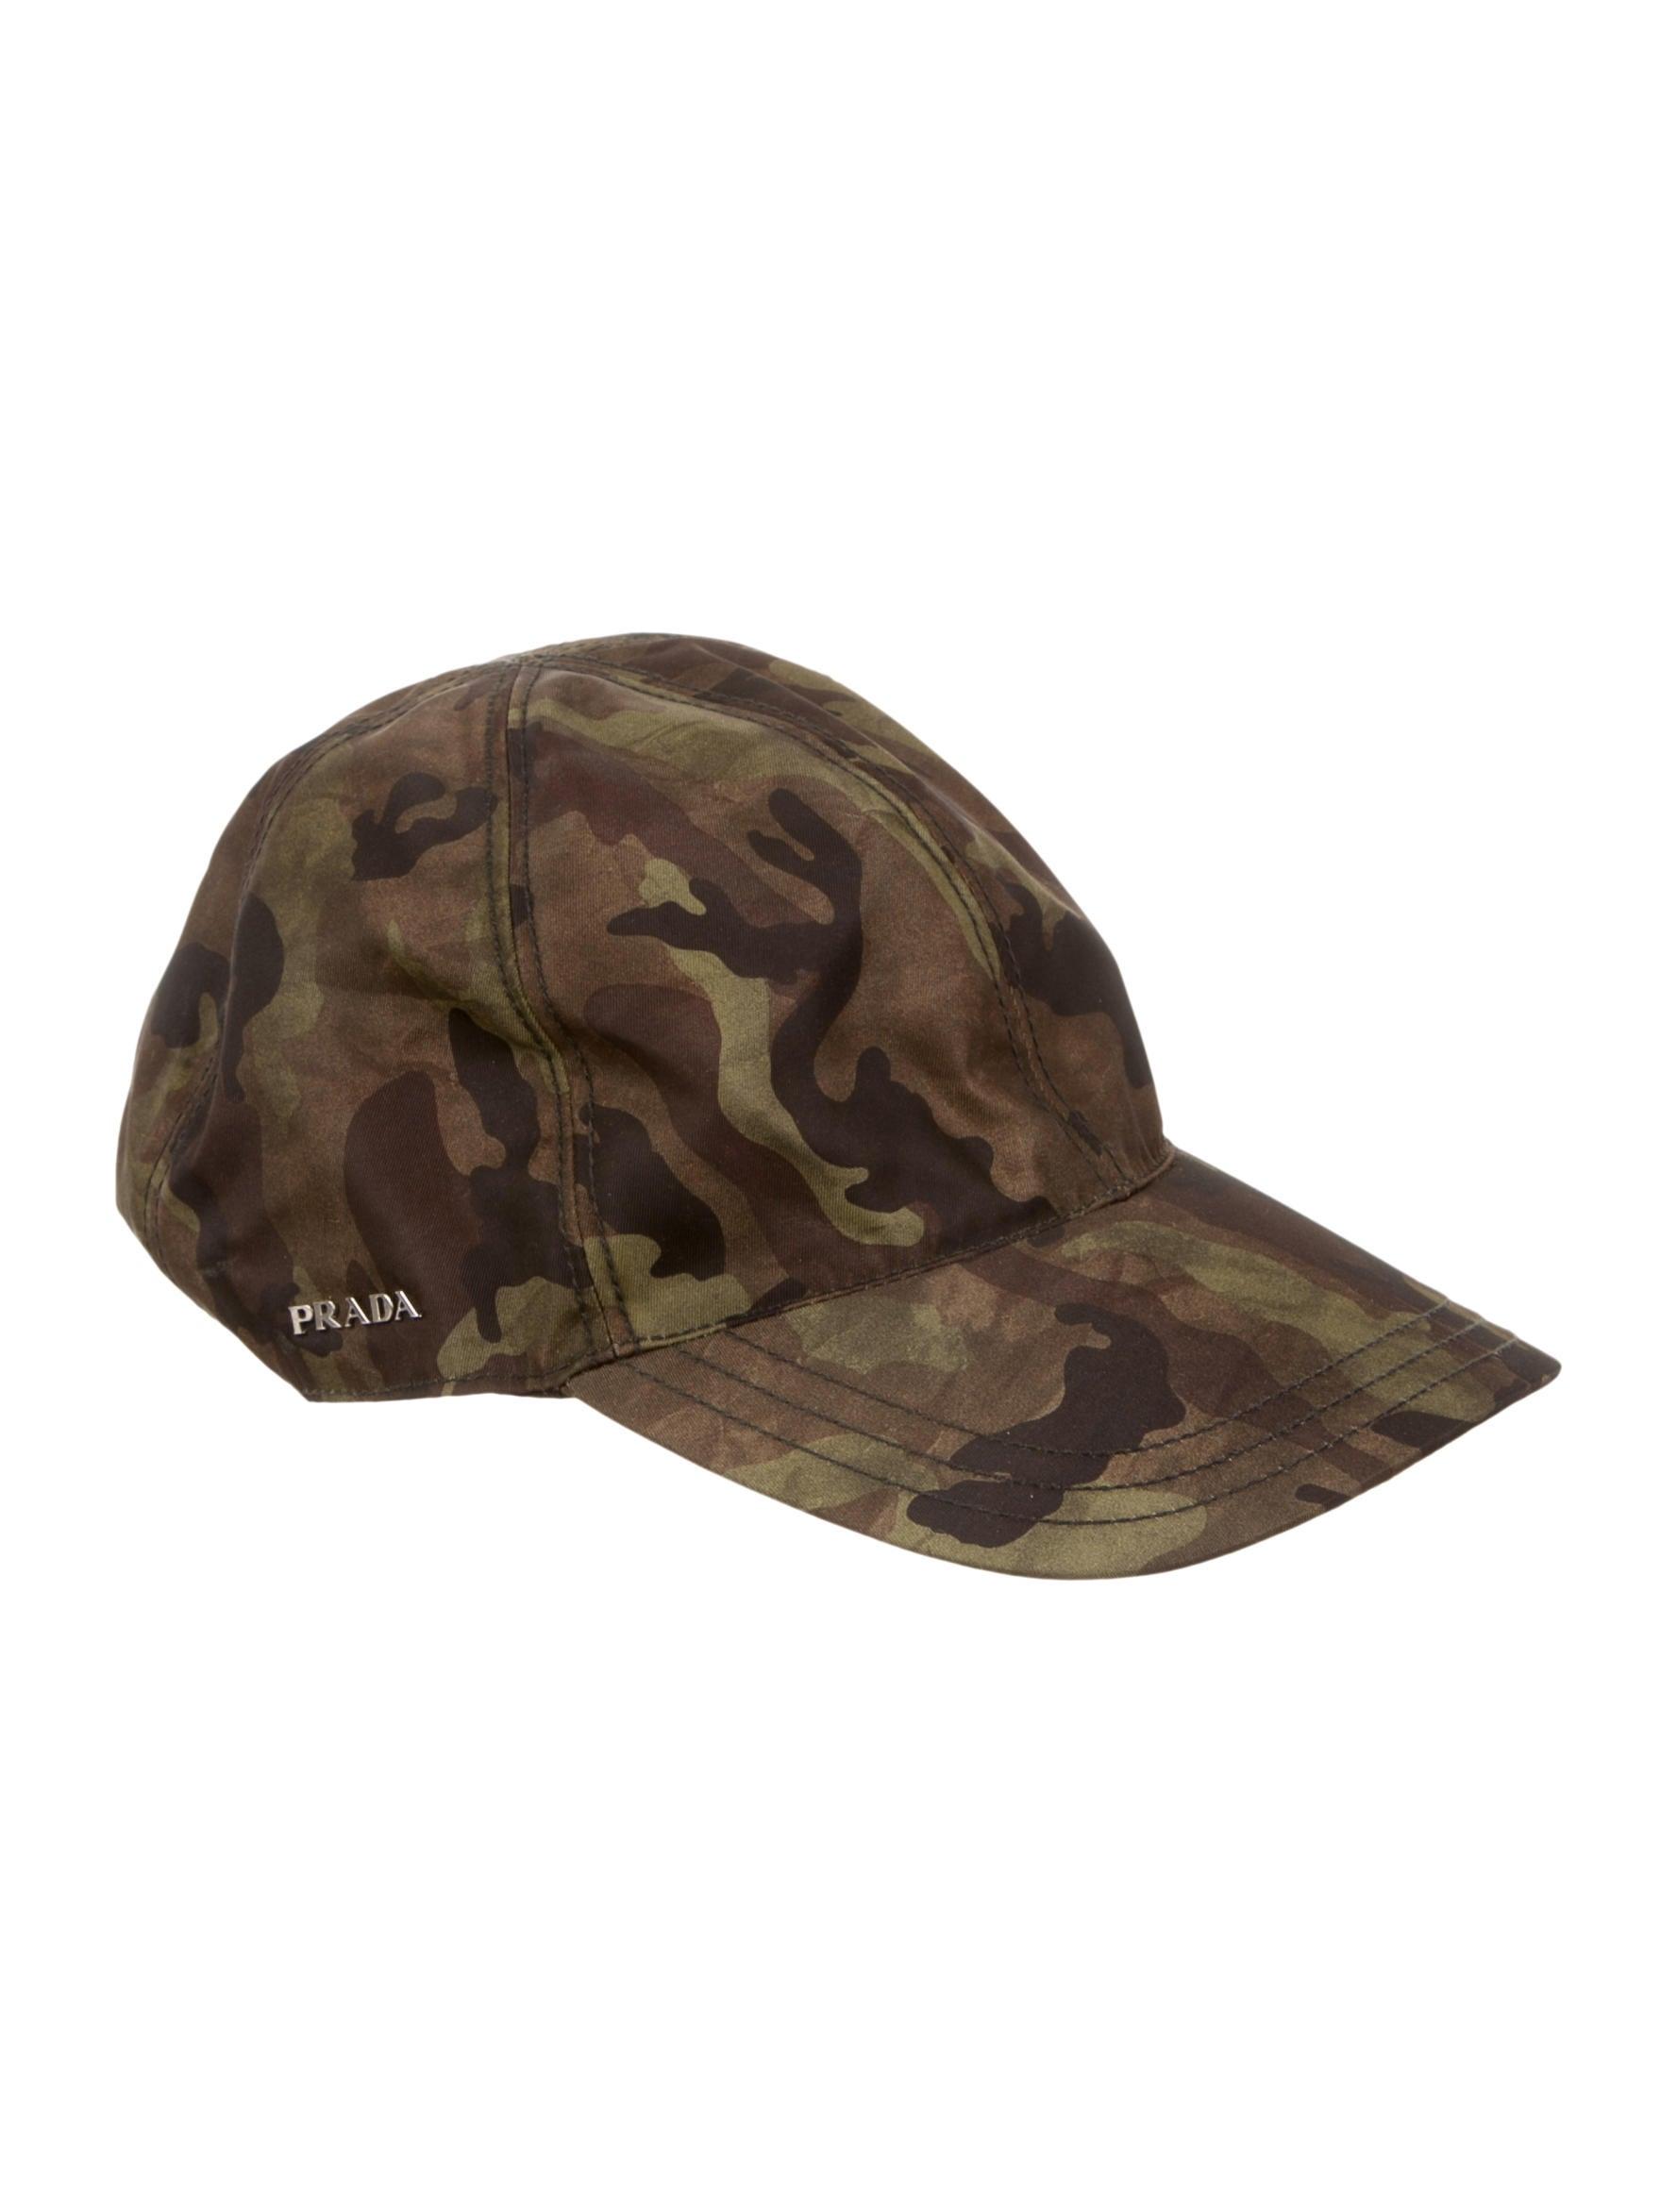 Prada Camouflage Hat - Accessories - PRA75152  ef86344aa85e